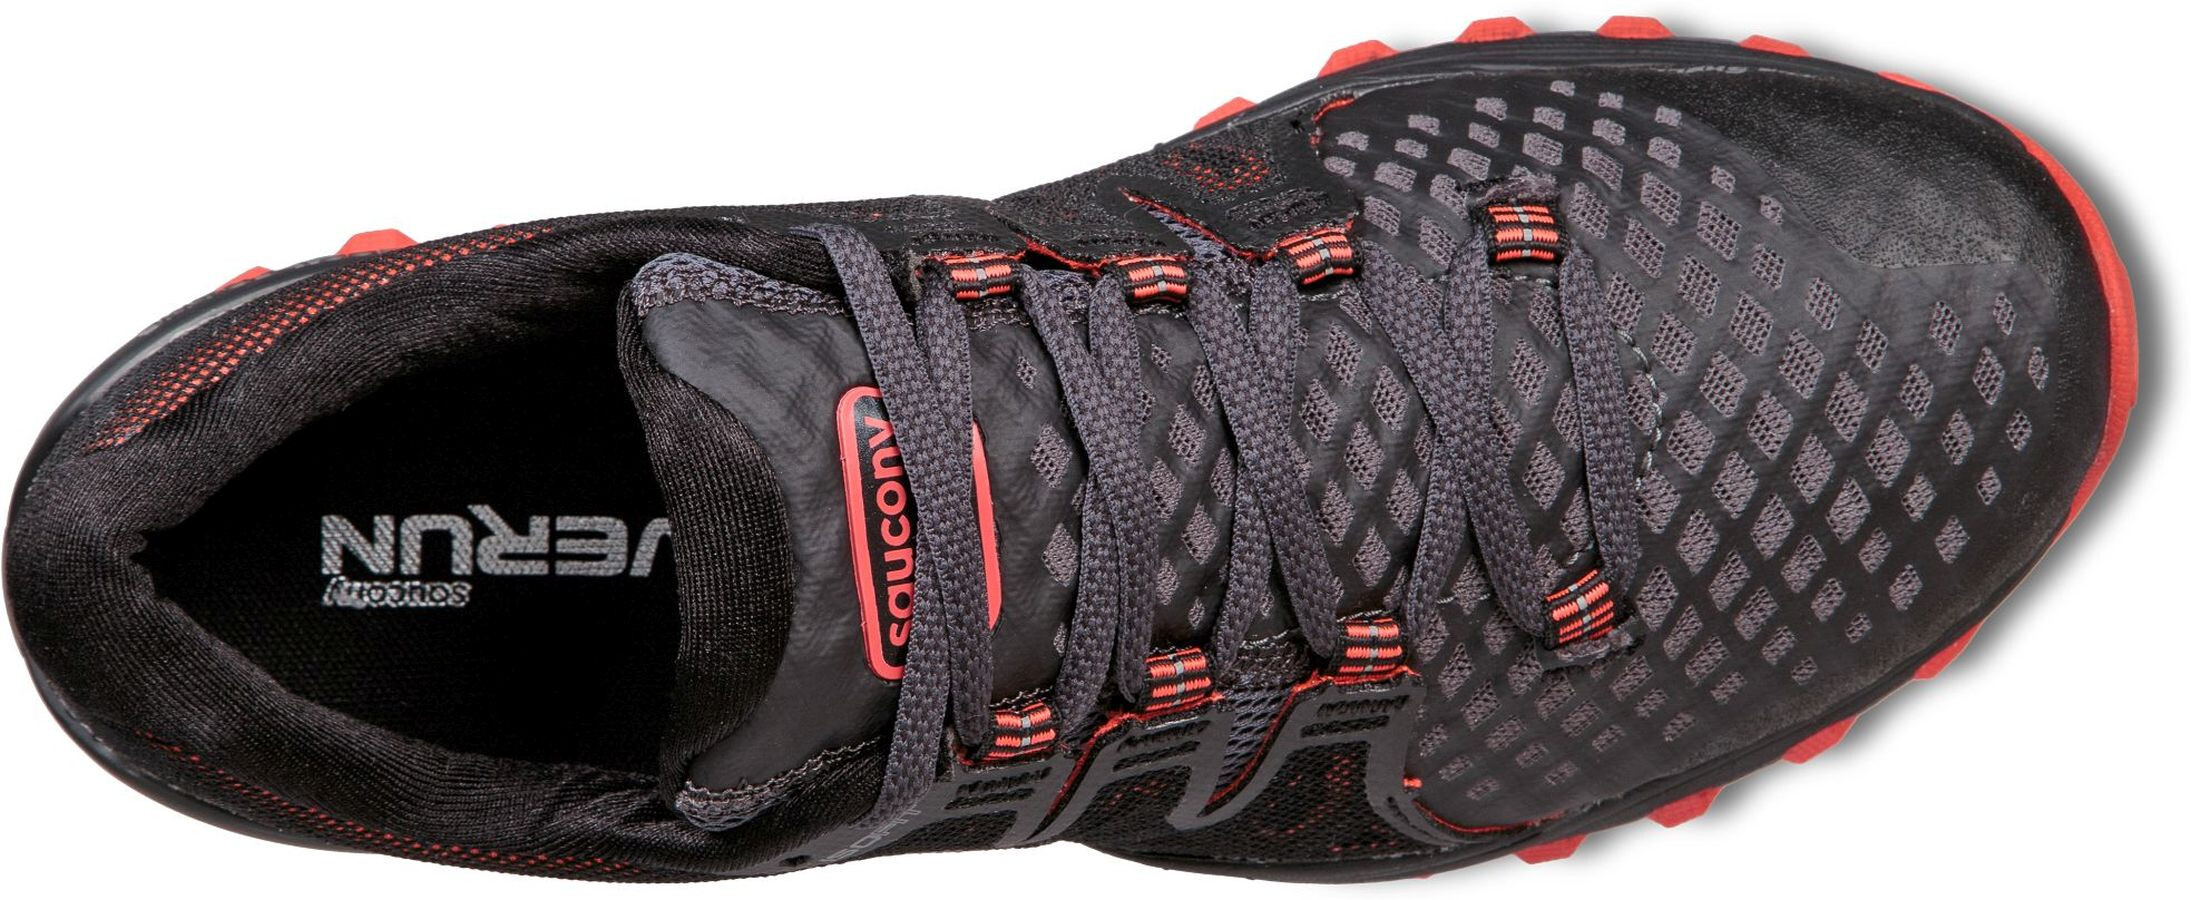 be2e474eb saucony Xodus Iso 2 GTX - Zapatillas running Mujer - gris